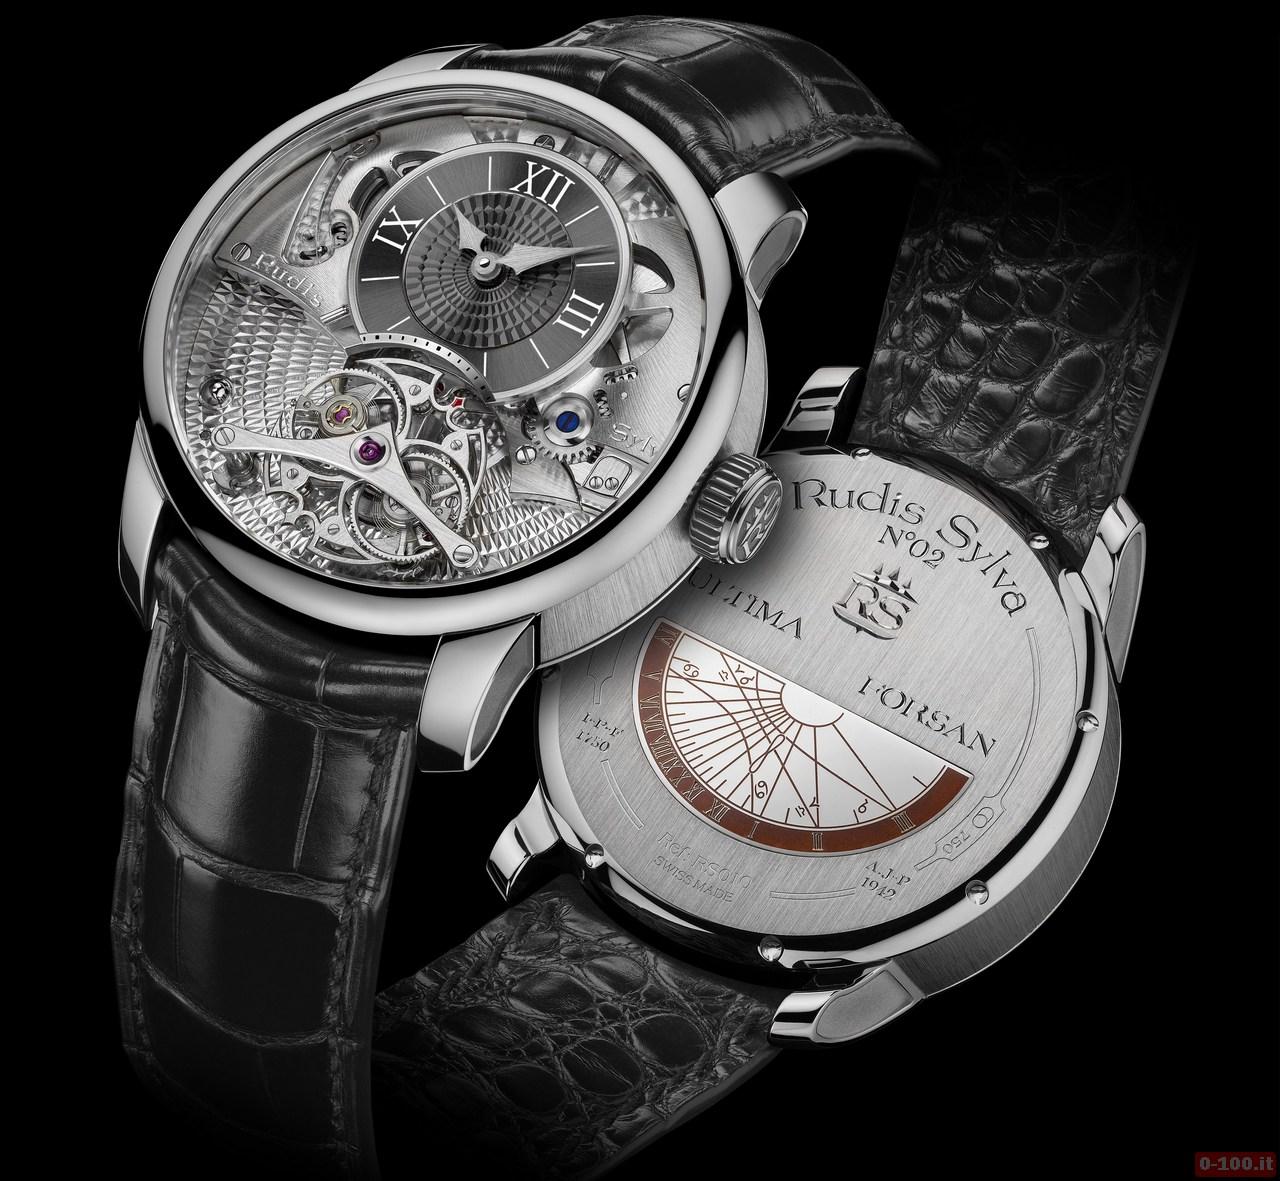 rudis-sylva-rs12-grand-art-horloger_0-100_2